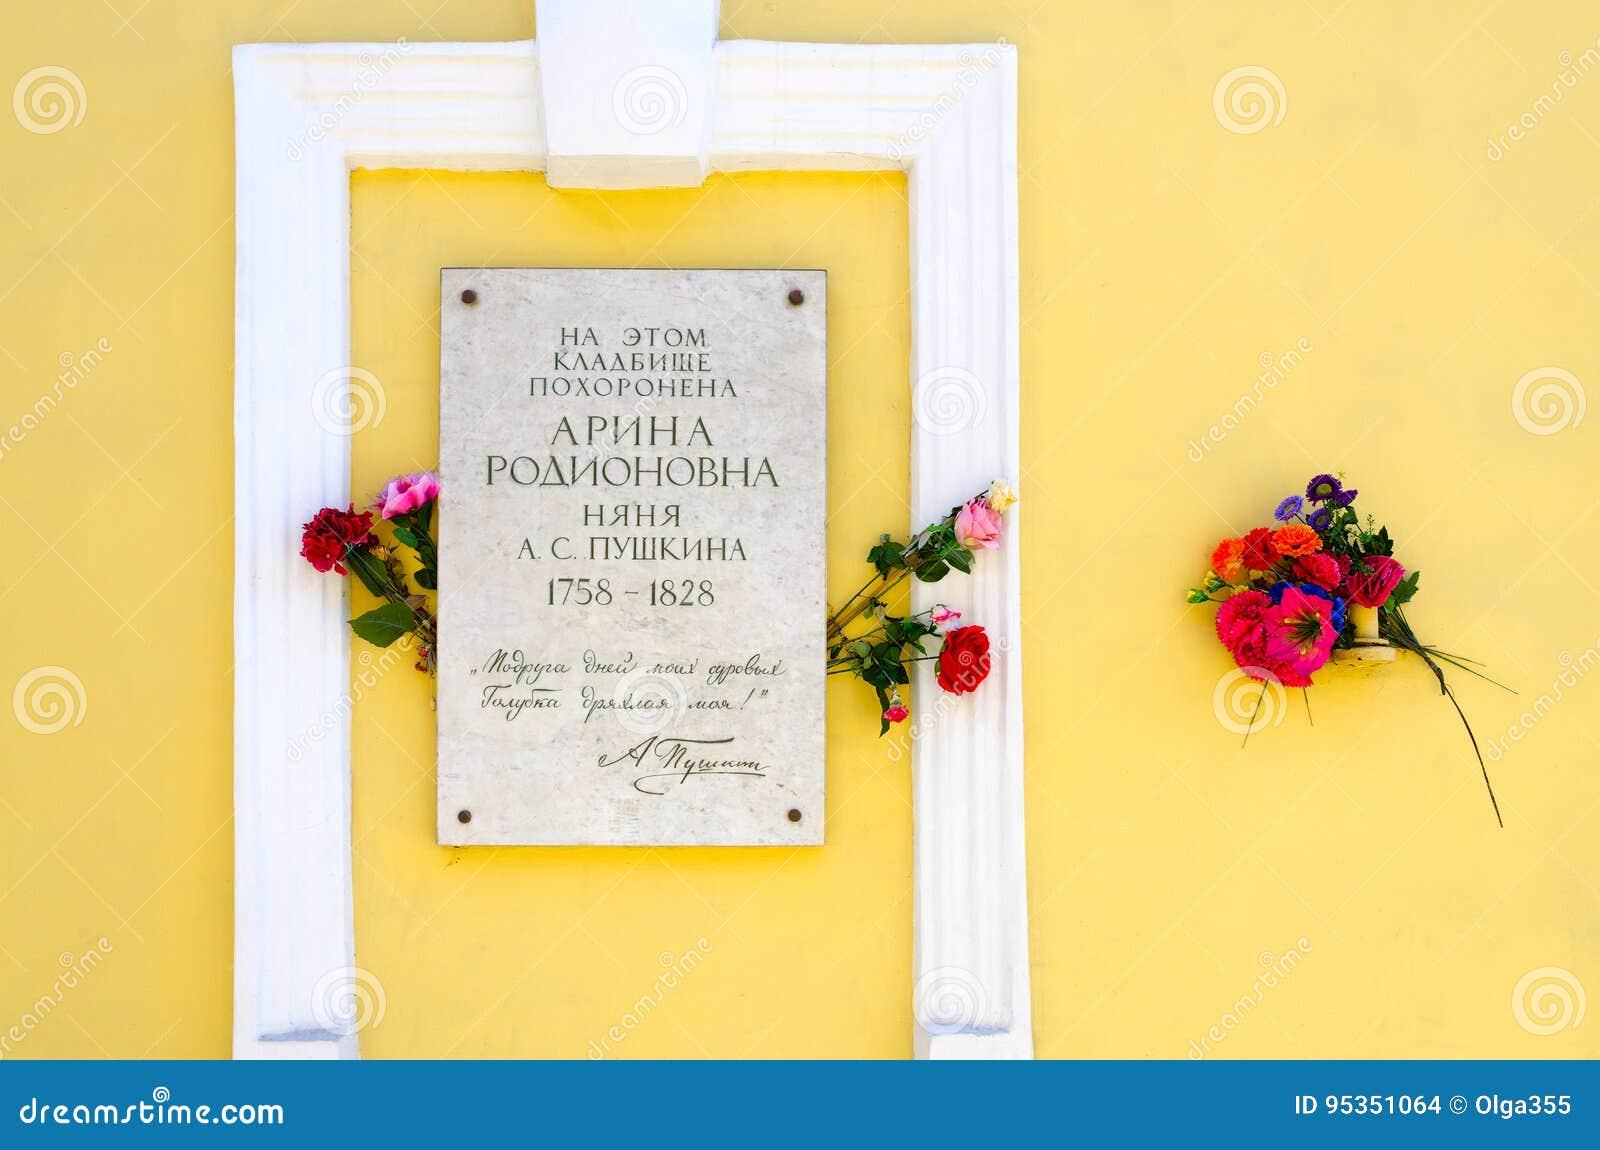 Memorial plaque at Smolensk cemetery in St. Petersburg, Russia